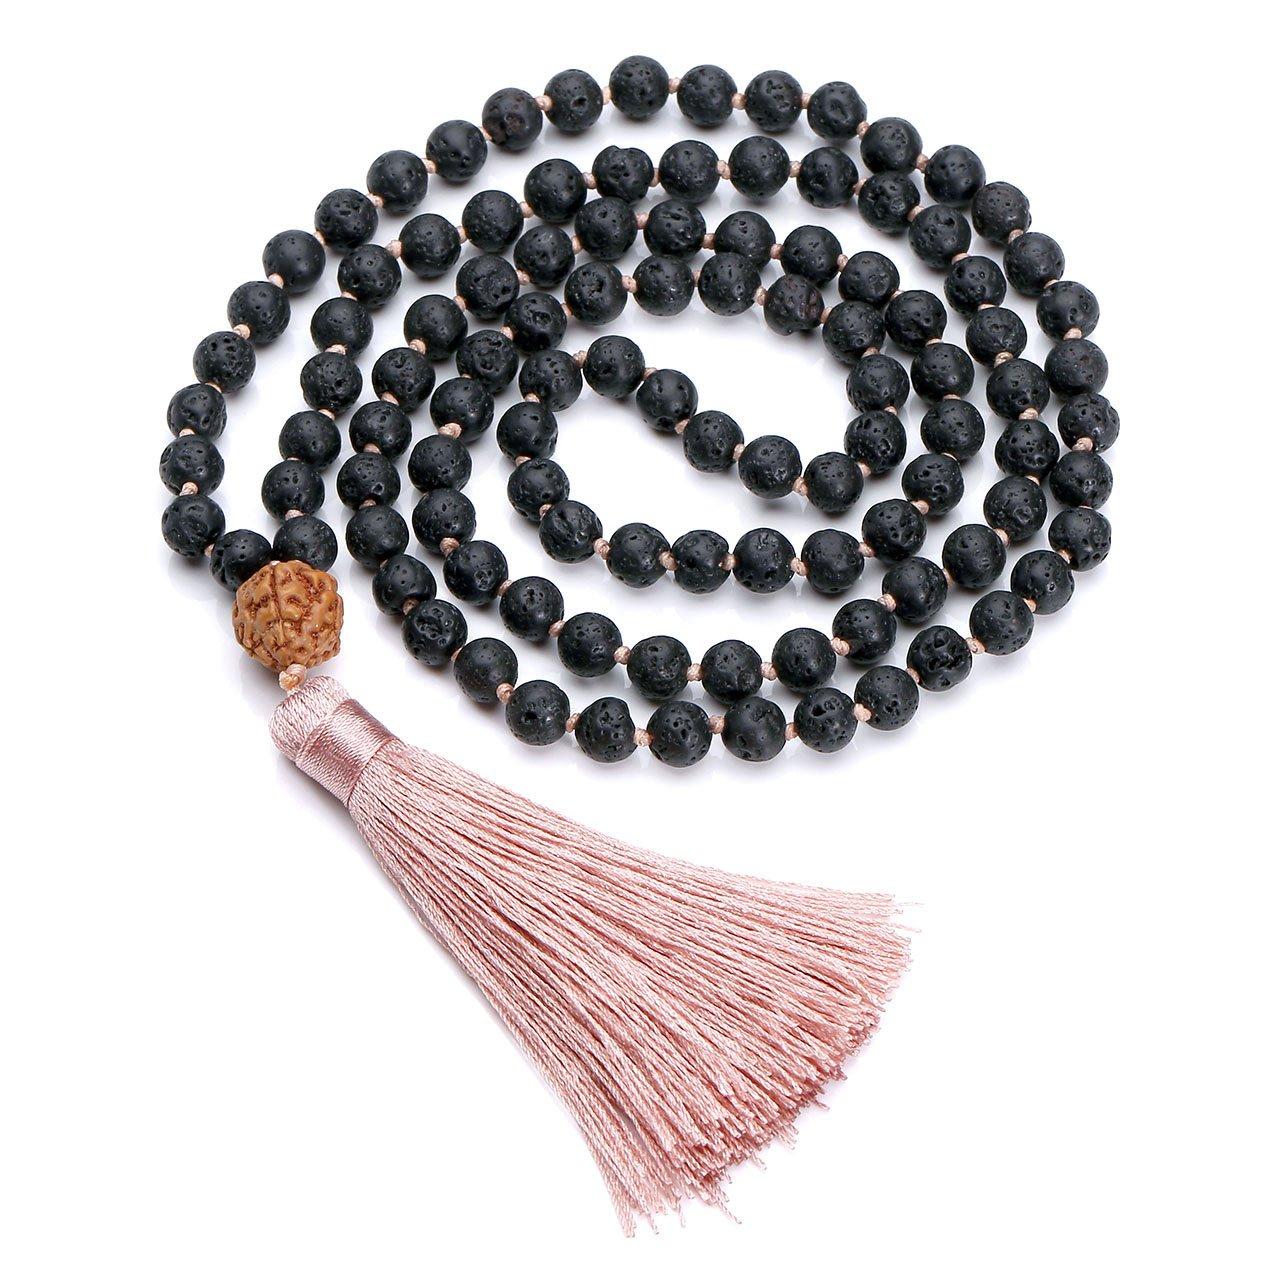 Top Plaza 6mm Natural Lava Rock Stone Healing Gemstone 108 Buddhist Prayer Beads Tibetan Mala Bracelet Necklace with Rudraksha Long Tassel Charm(Nude Pink)